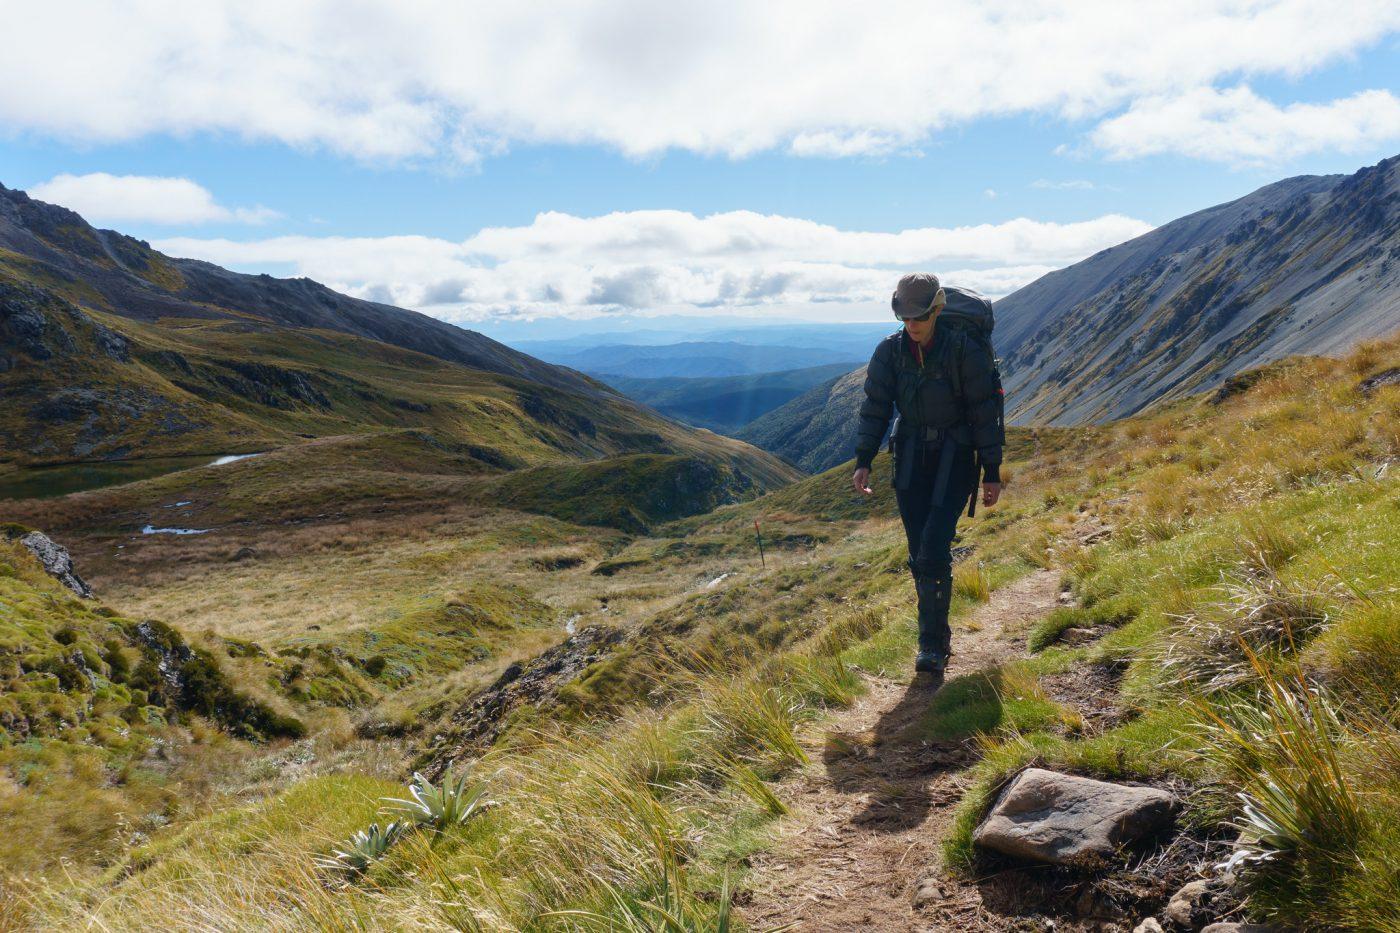 New Zealand South Island Hikes - Angelus Hut (via Pinchgut Track), Nelson Lakes